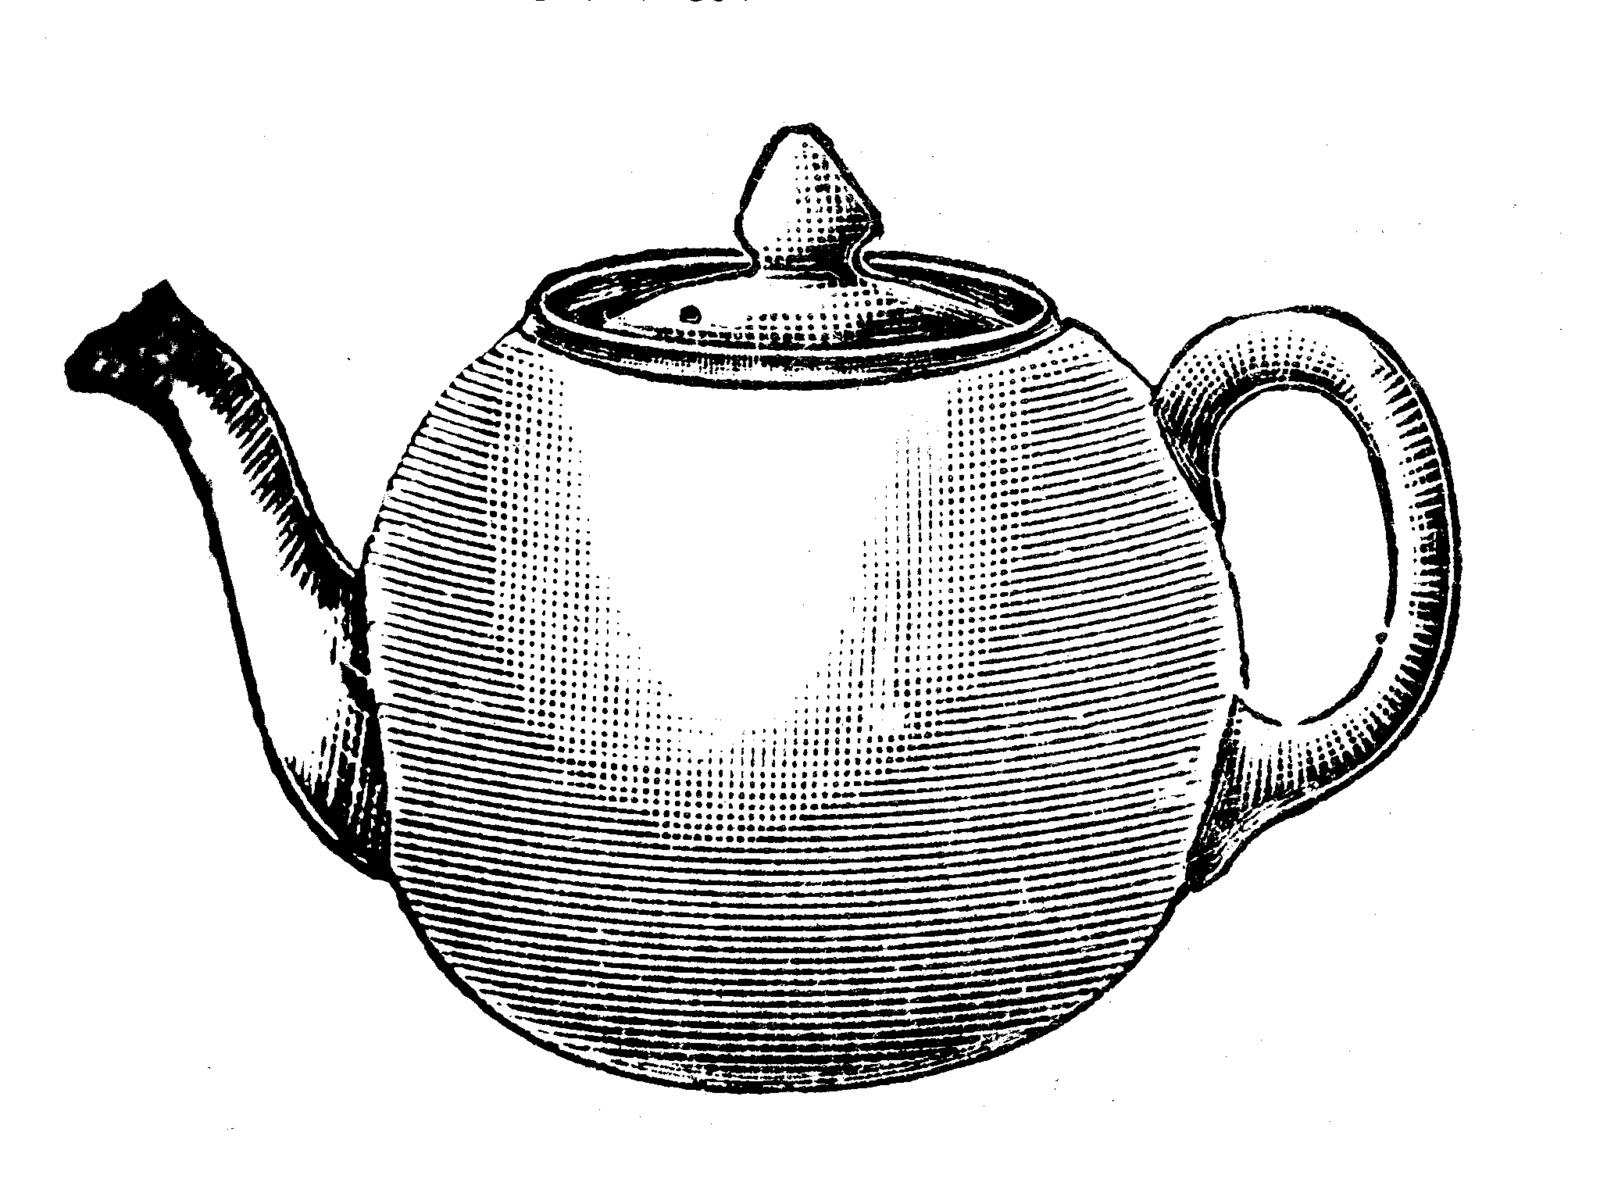 Drawn teacup crockery #6